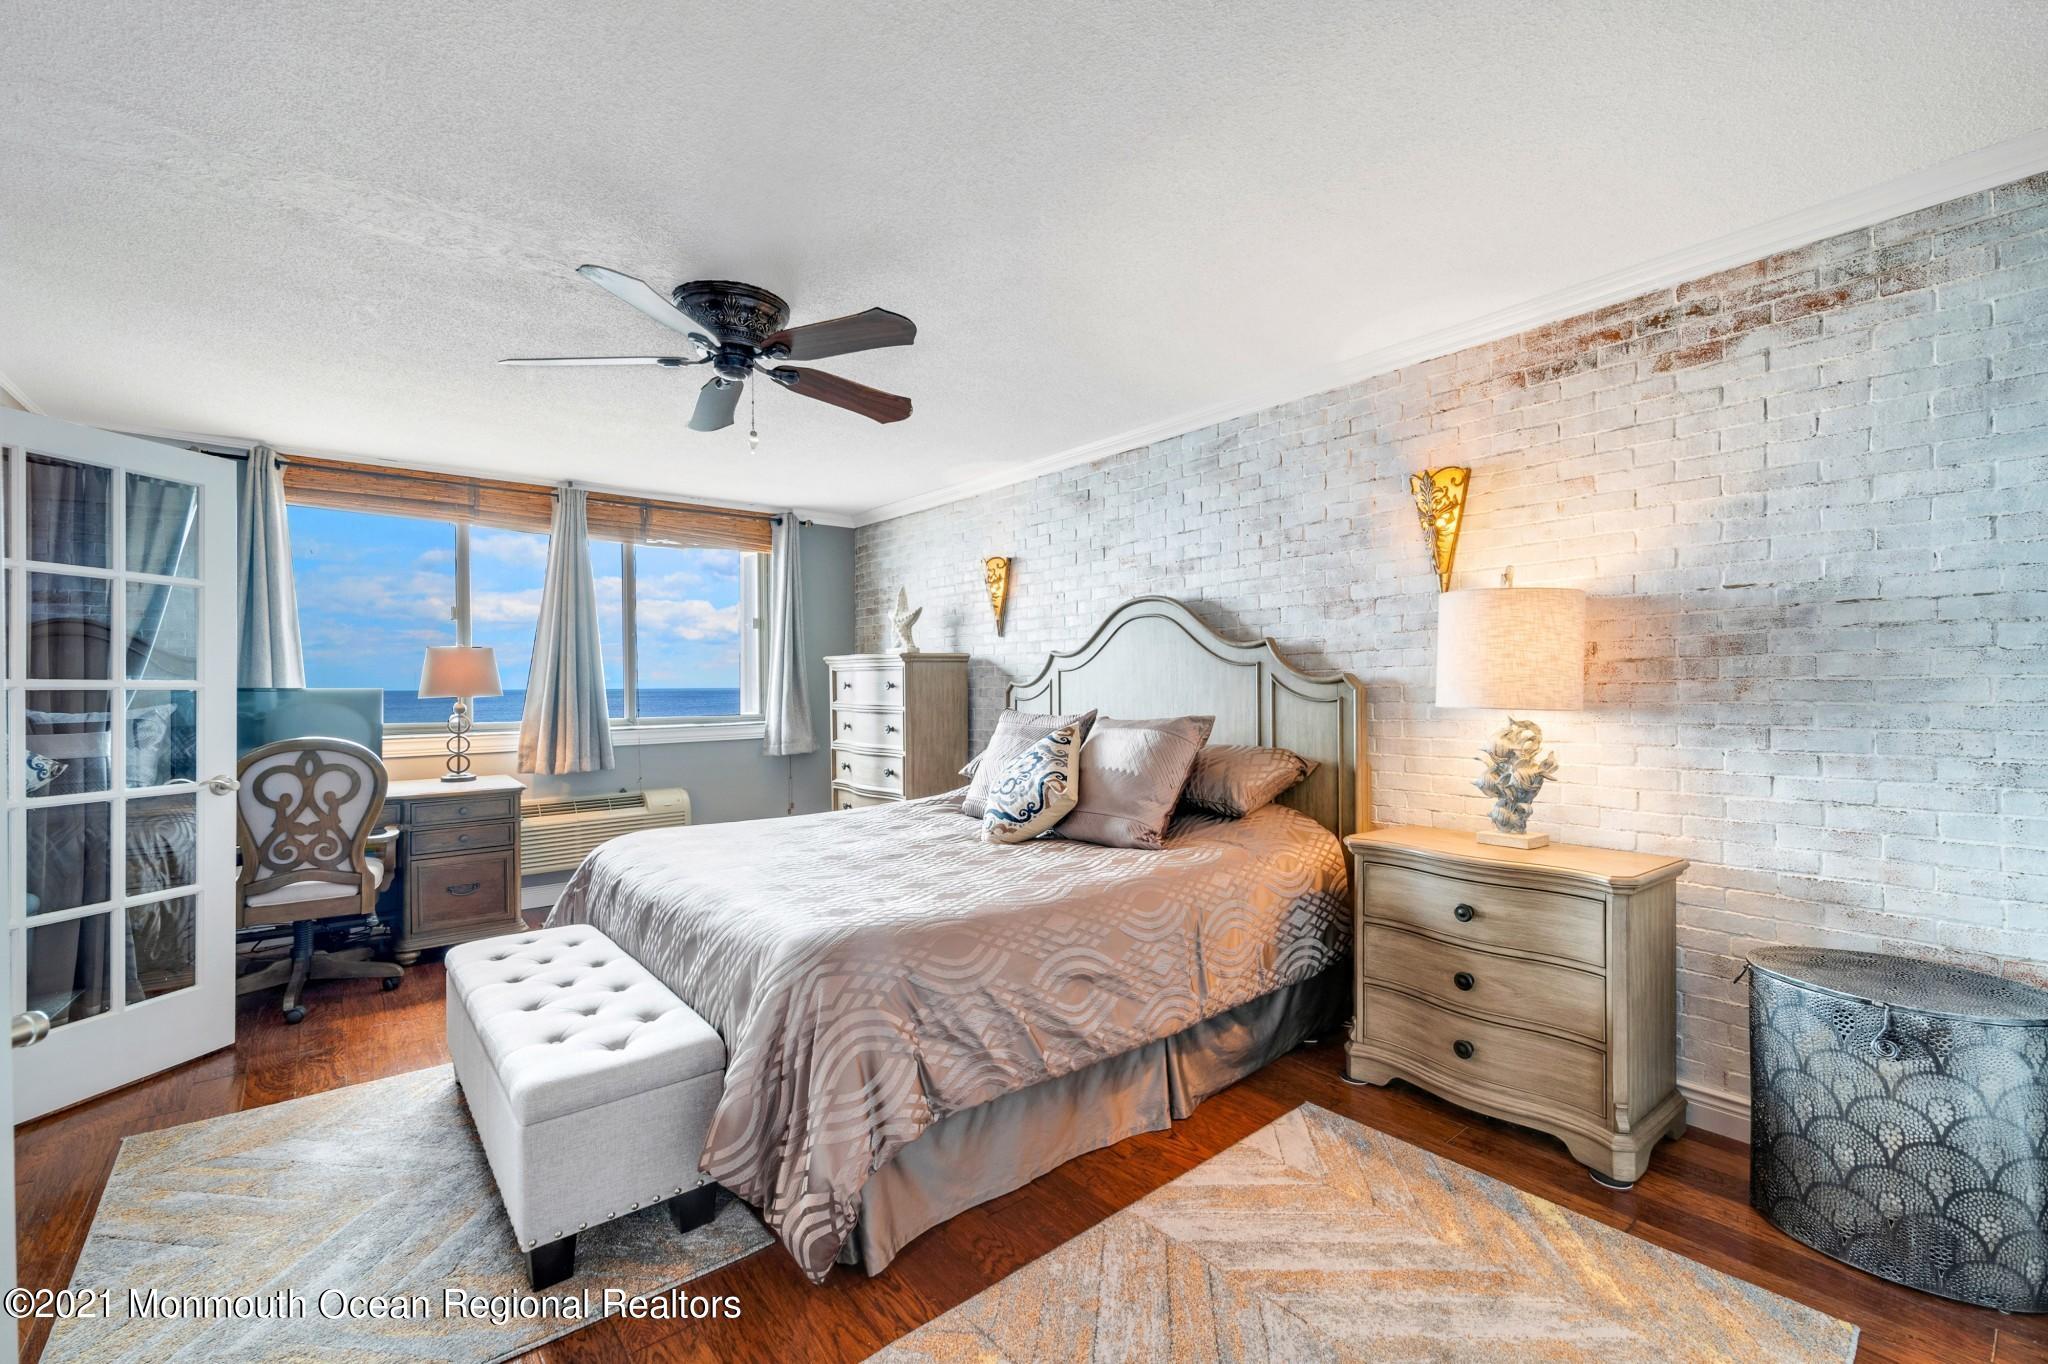 55 Ocean Avenue # 3E, Monmouth Beach, NJ 07750